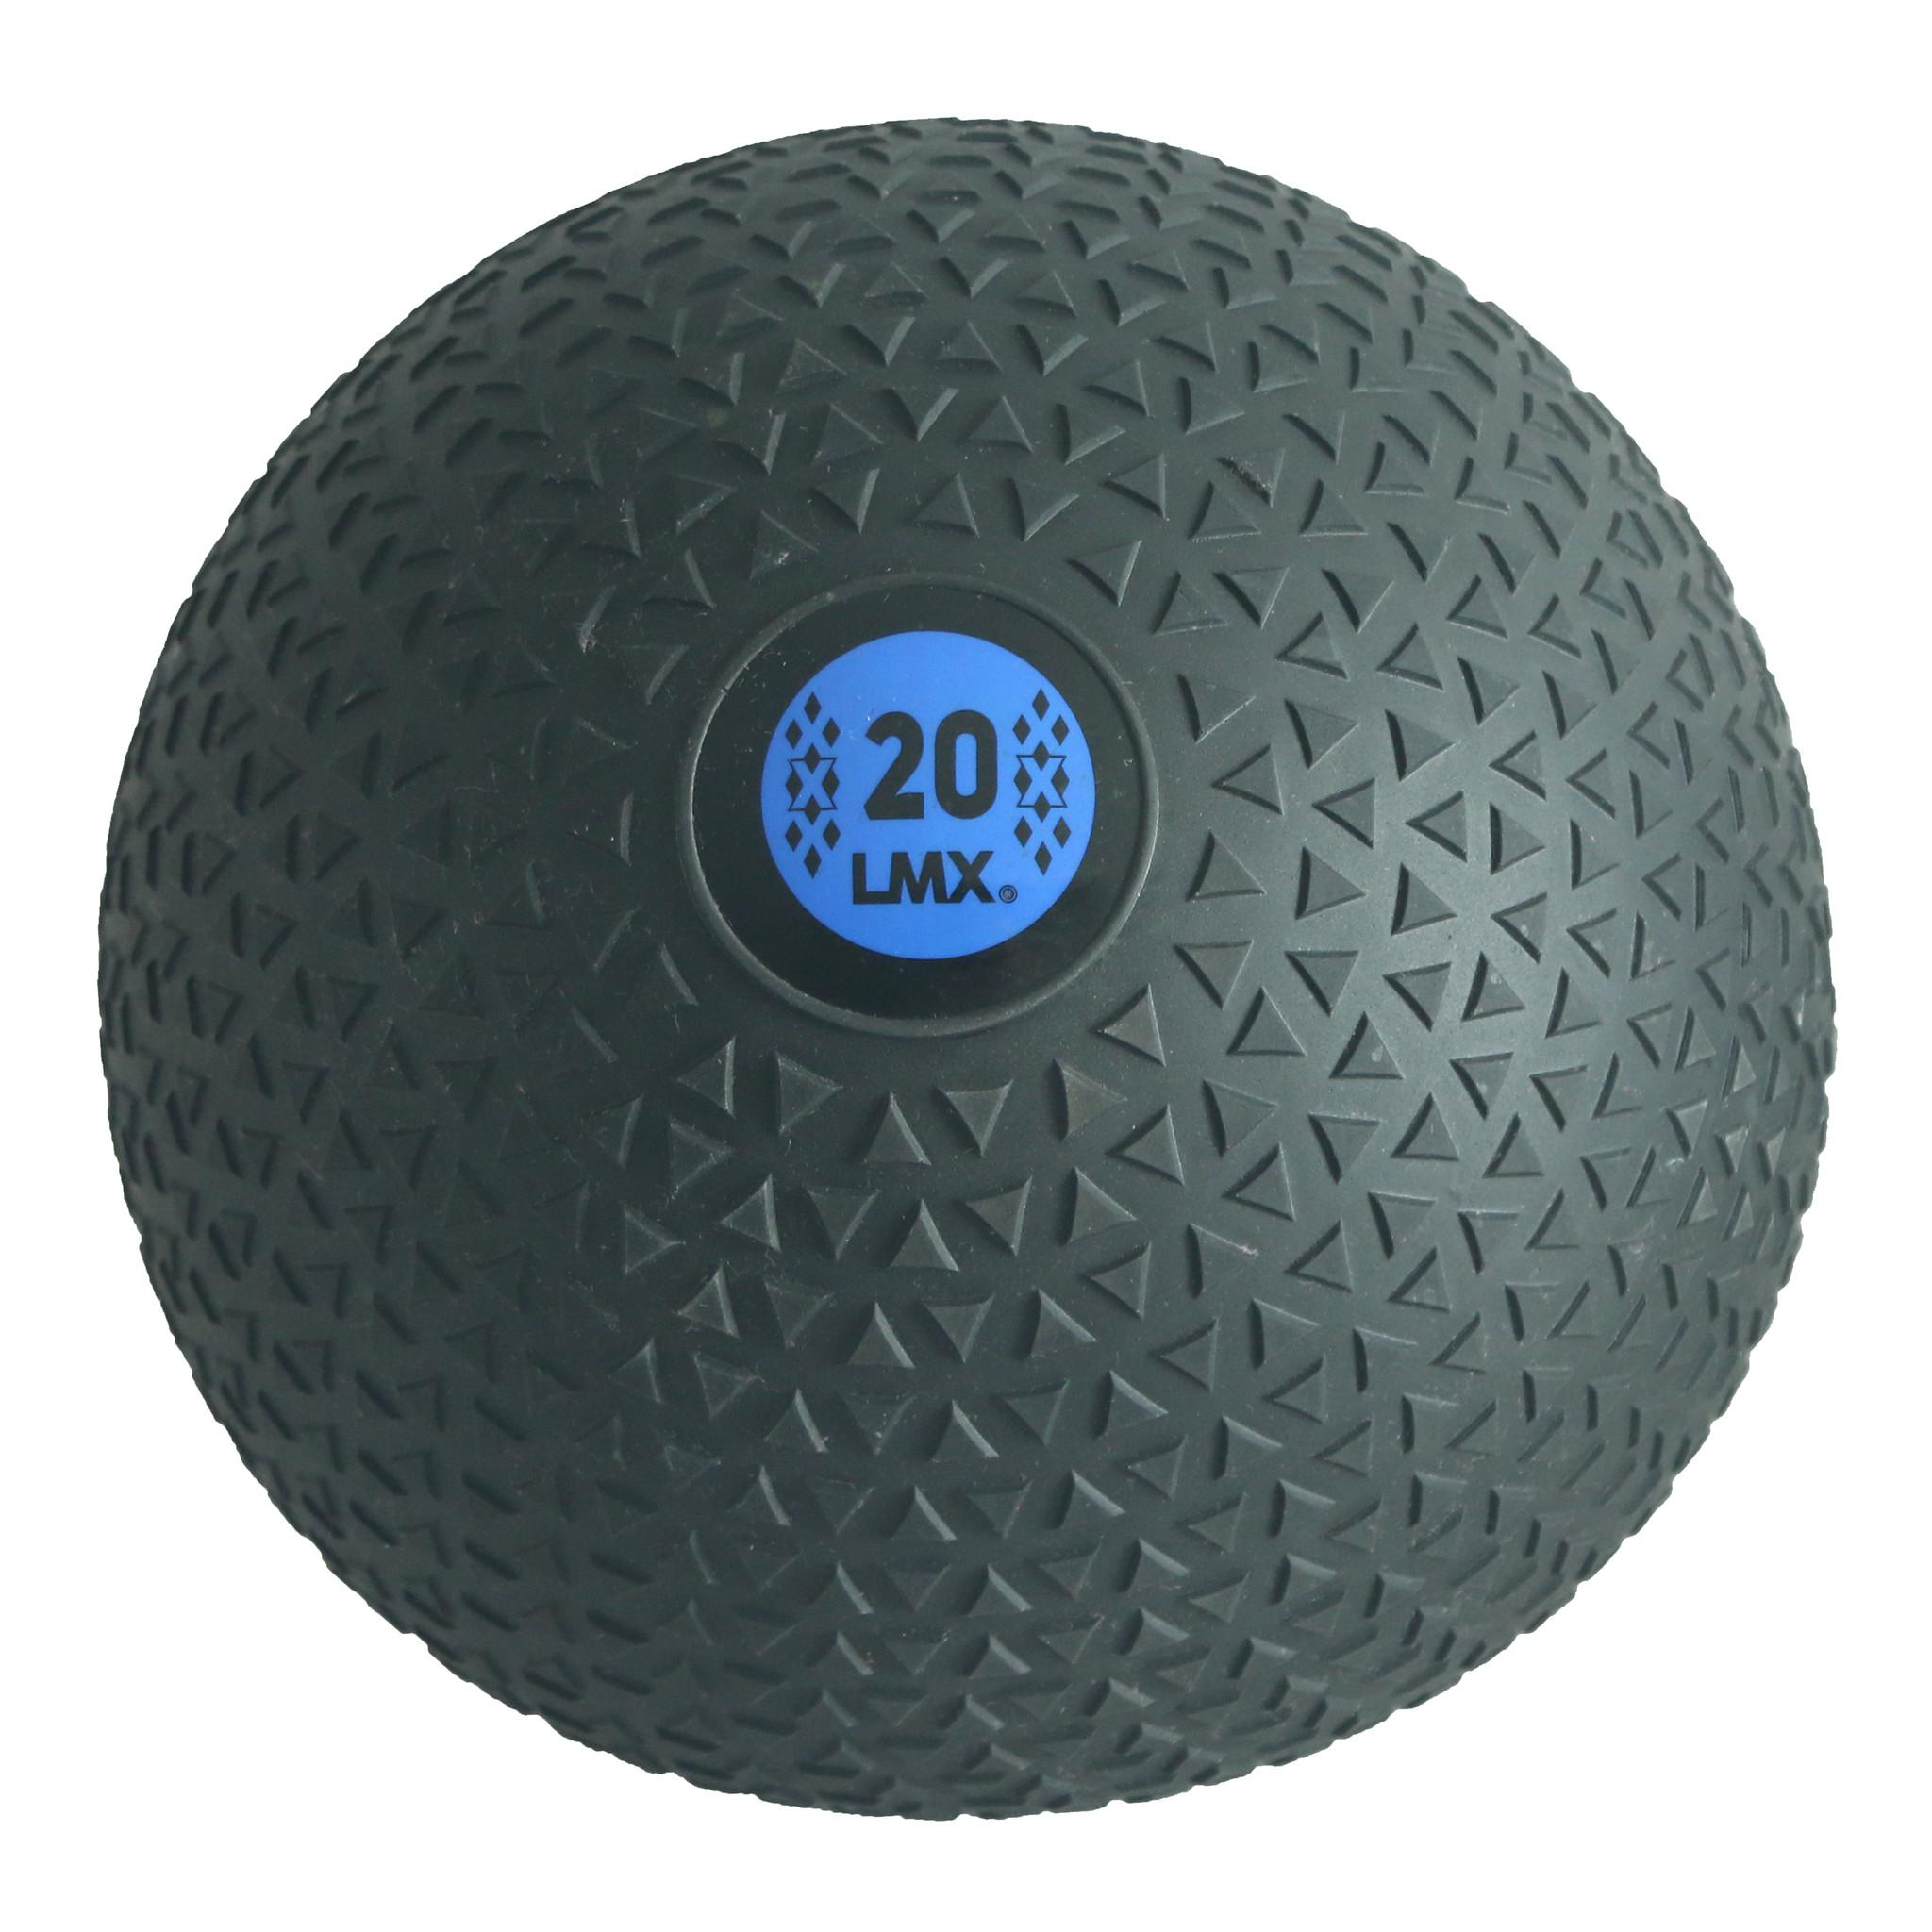 Lifemaxx Slamball 20 kg